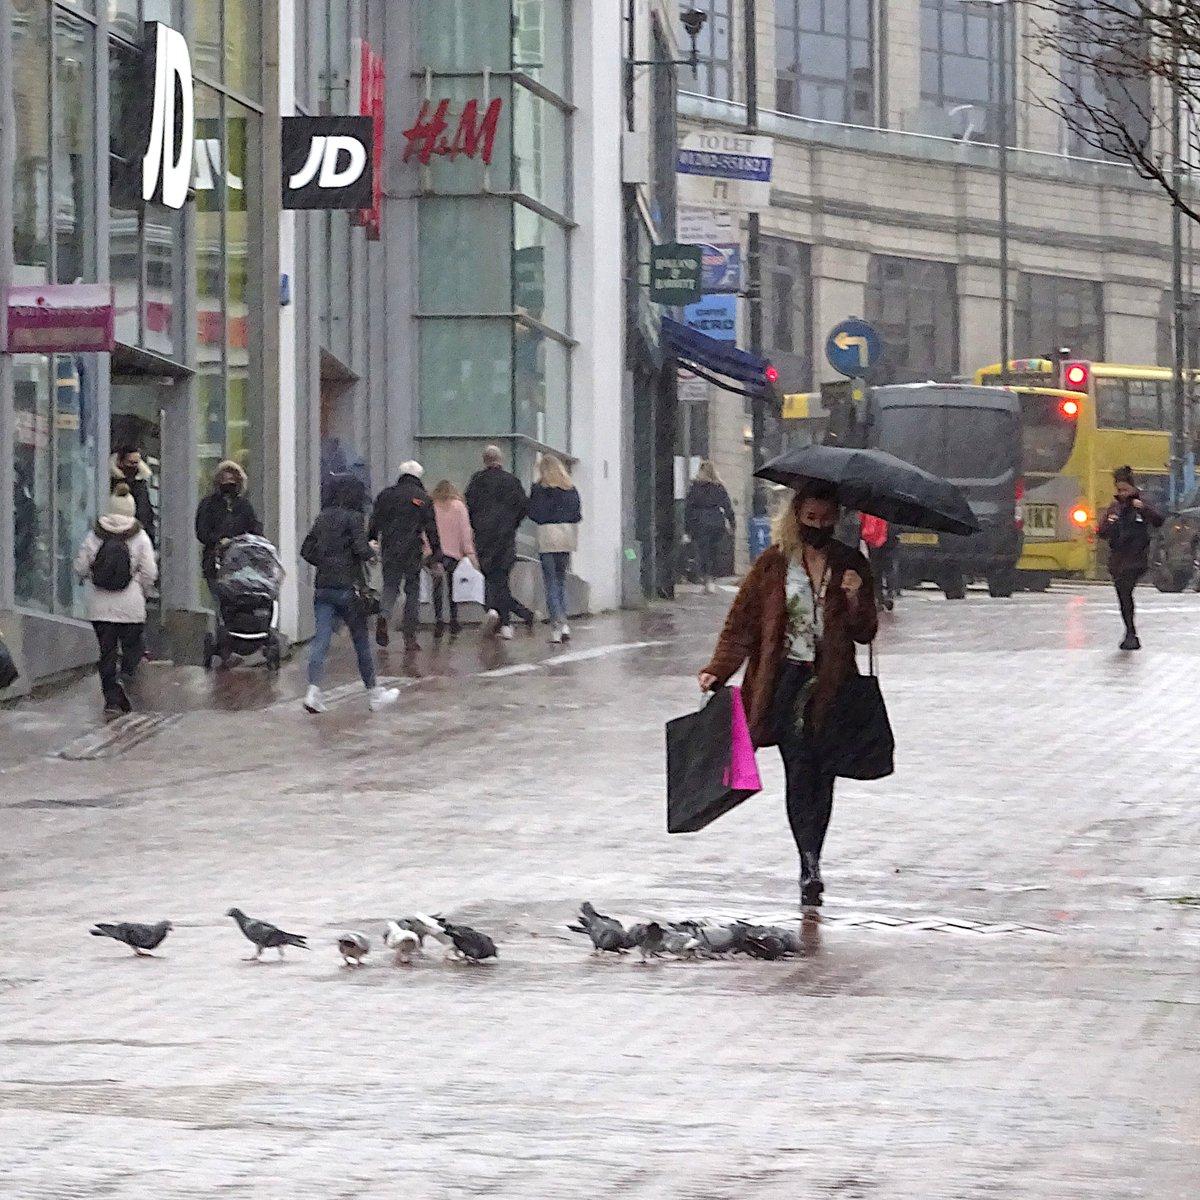 Umbrella & Pigeons #streetphotography #photography #photos #photographer #photooftheday #photographers #streetsnap #ThePhotoHour #PhotographyIsLife #colorphotography #street #streets #StreetStyle #StreetStyleDaily #streetscene #umbrella #rain #umbrellas